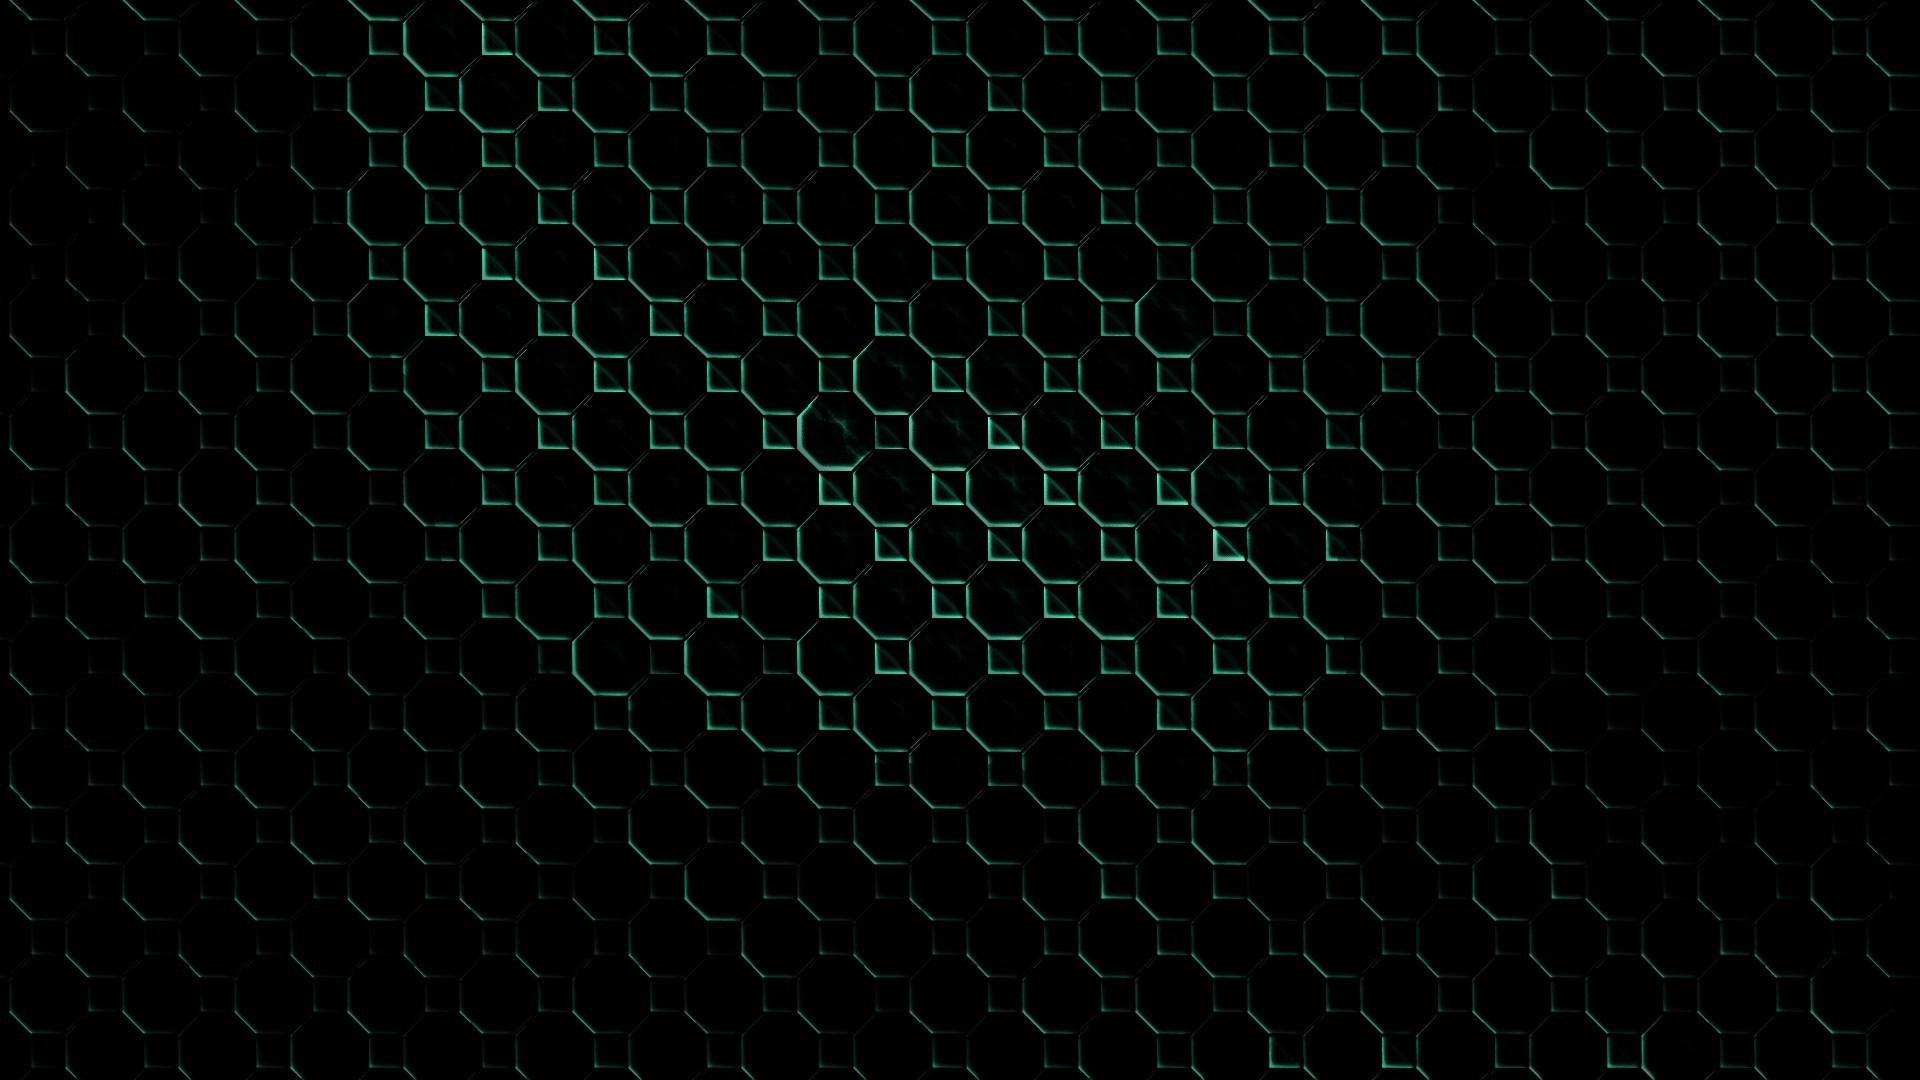 Wallpaper Digital Art Monochrome Black Background Abstract